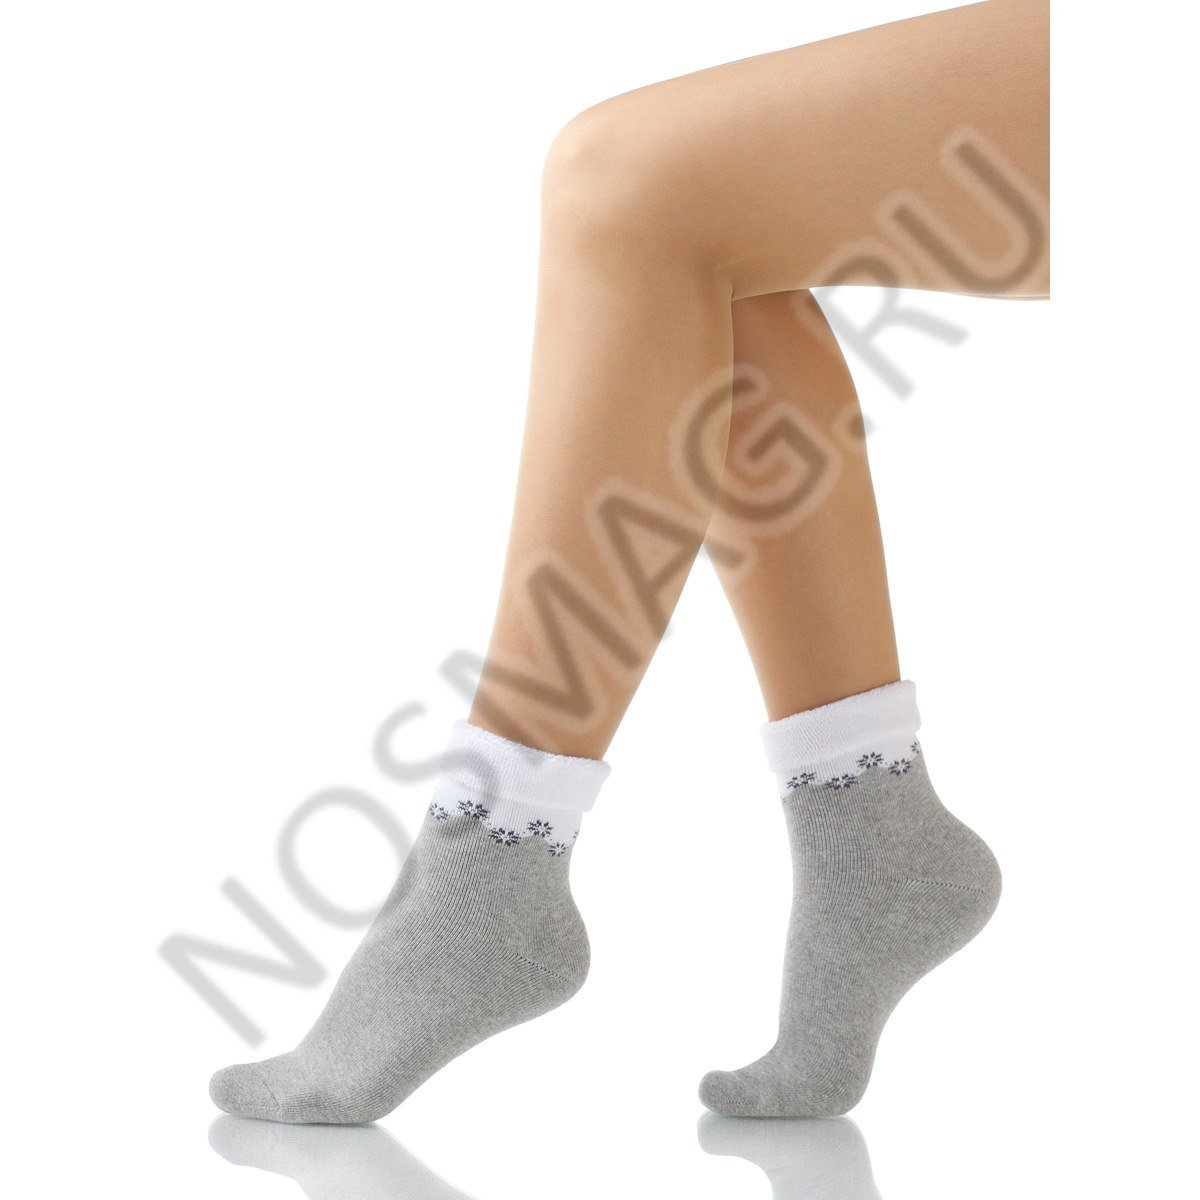 Носки женские махровые Charmante серый меланж